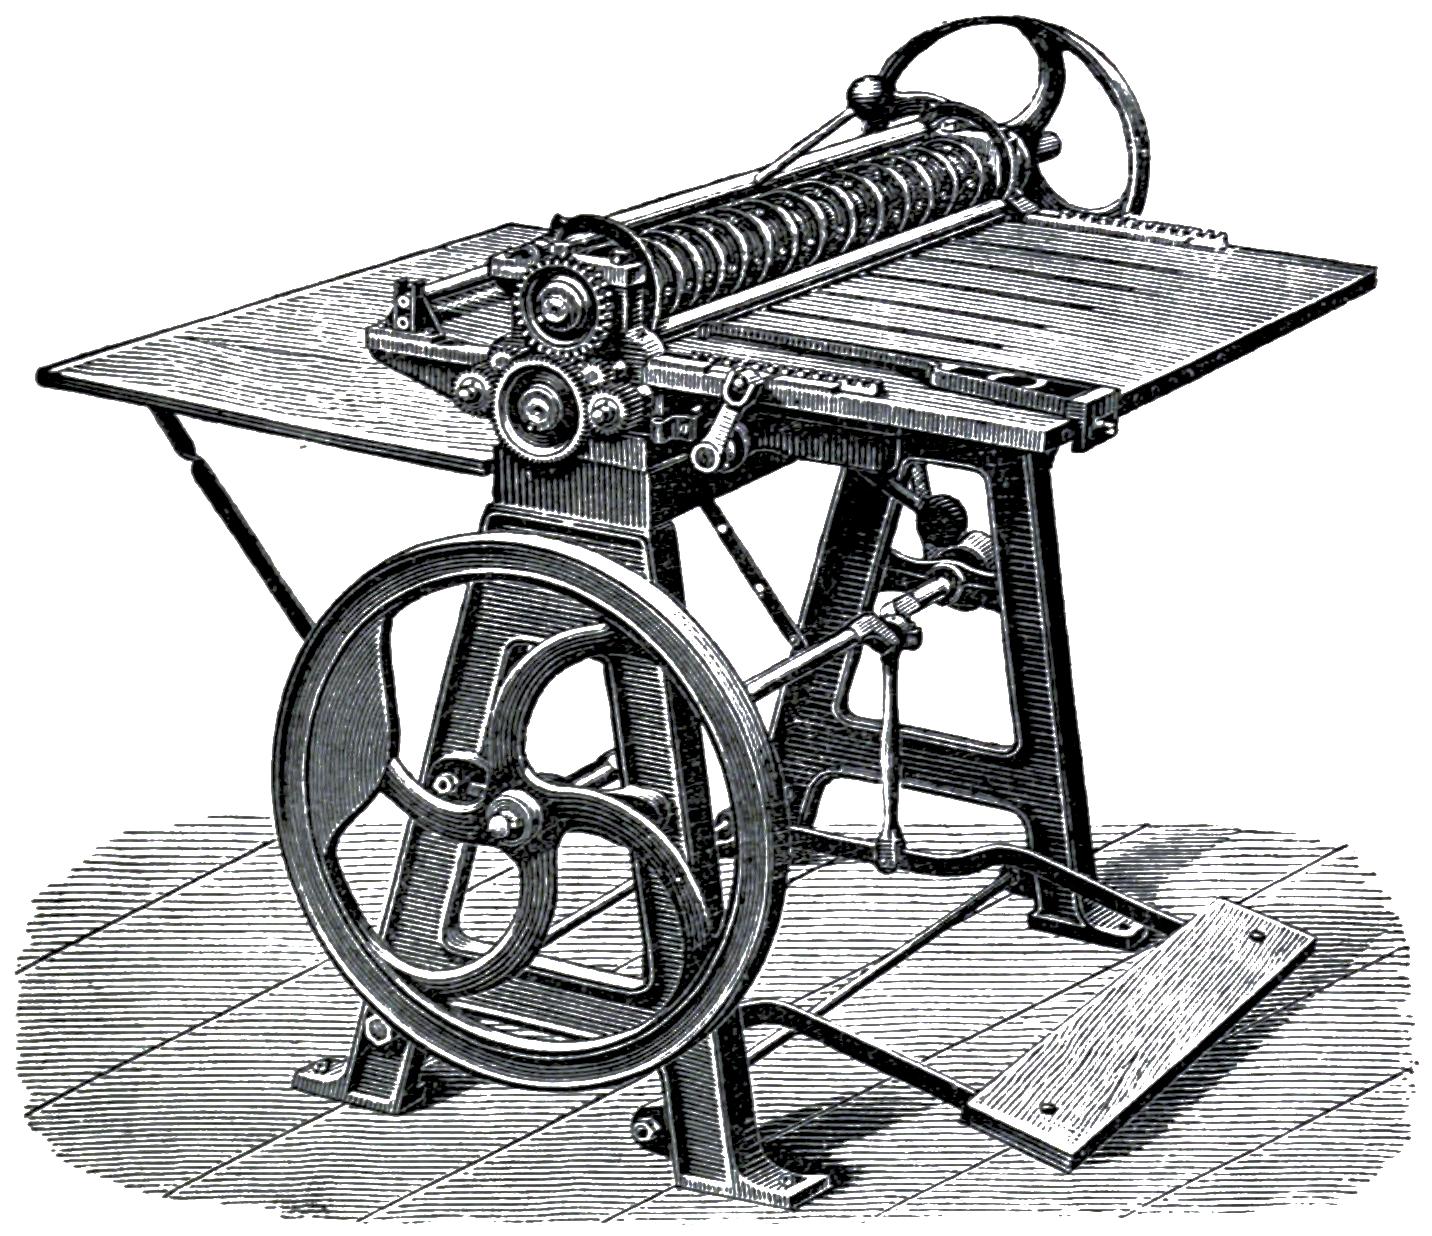 scarriedheimcardcuttingandscoringmachinefrom1889,capableofproducingupto100,000visitingandbusinesscardsaday